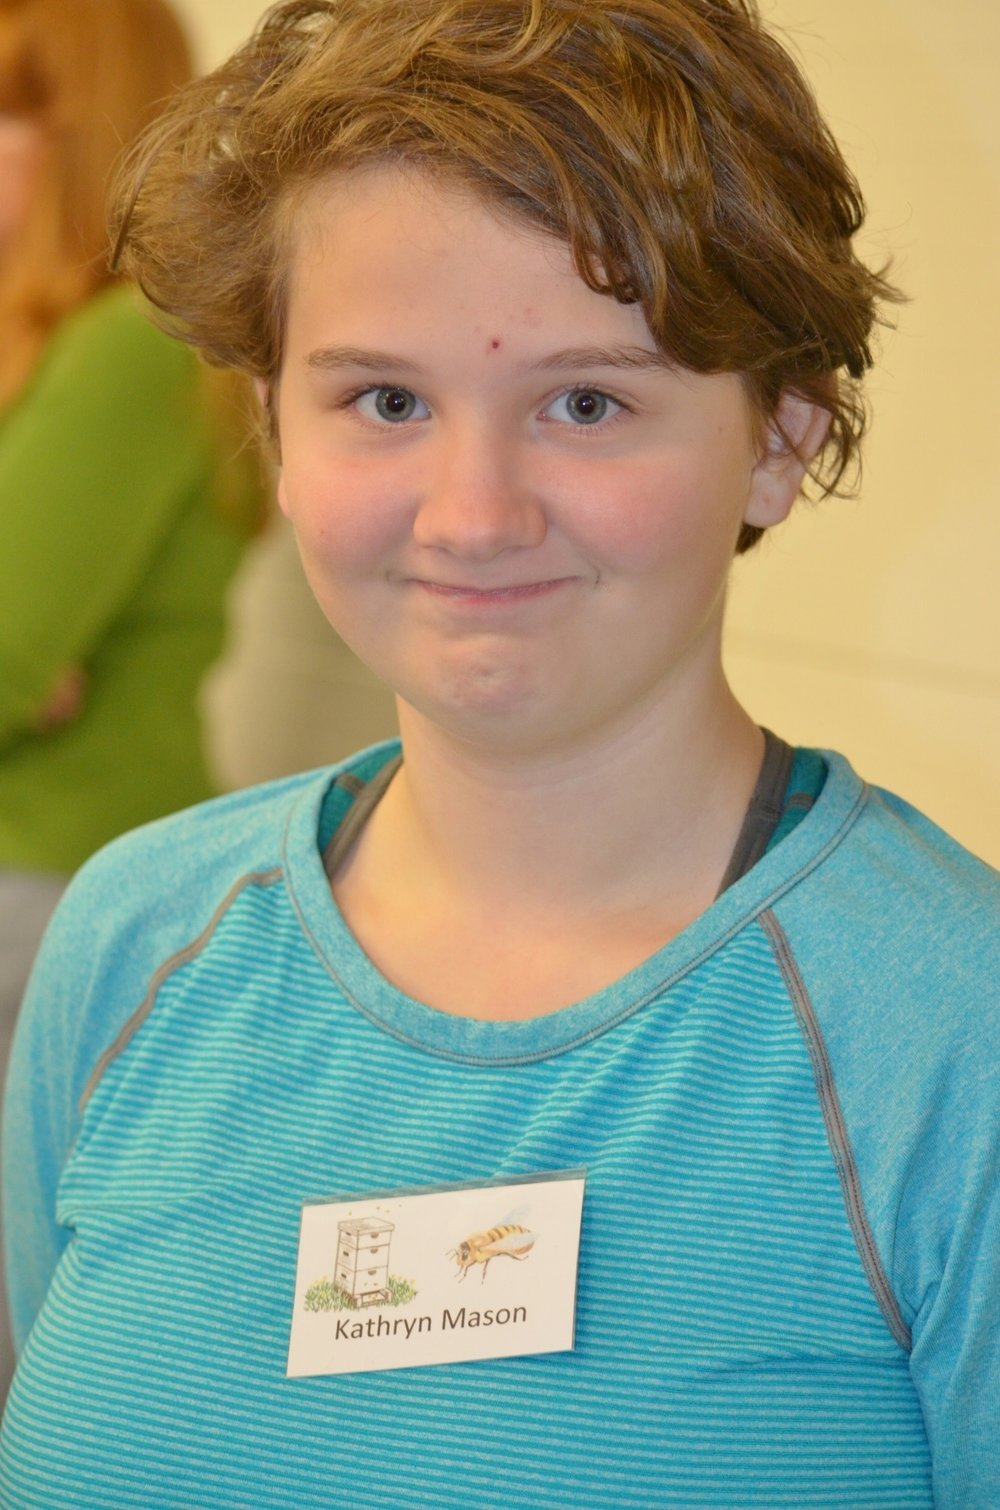 Kathryn Mason   Second Winner of the 2016-2017 Judy Wilhelm Youth Beekeeping Scholarship Award